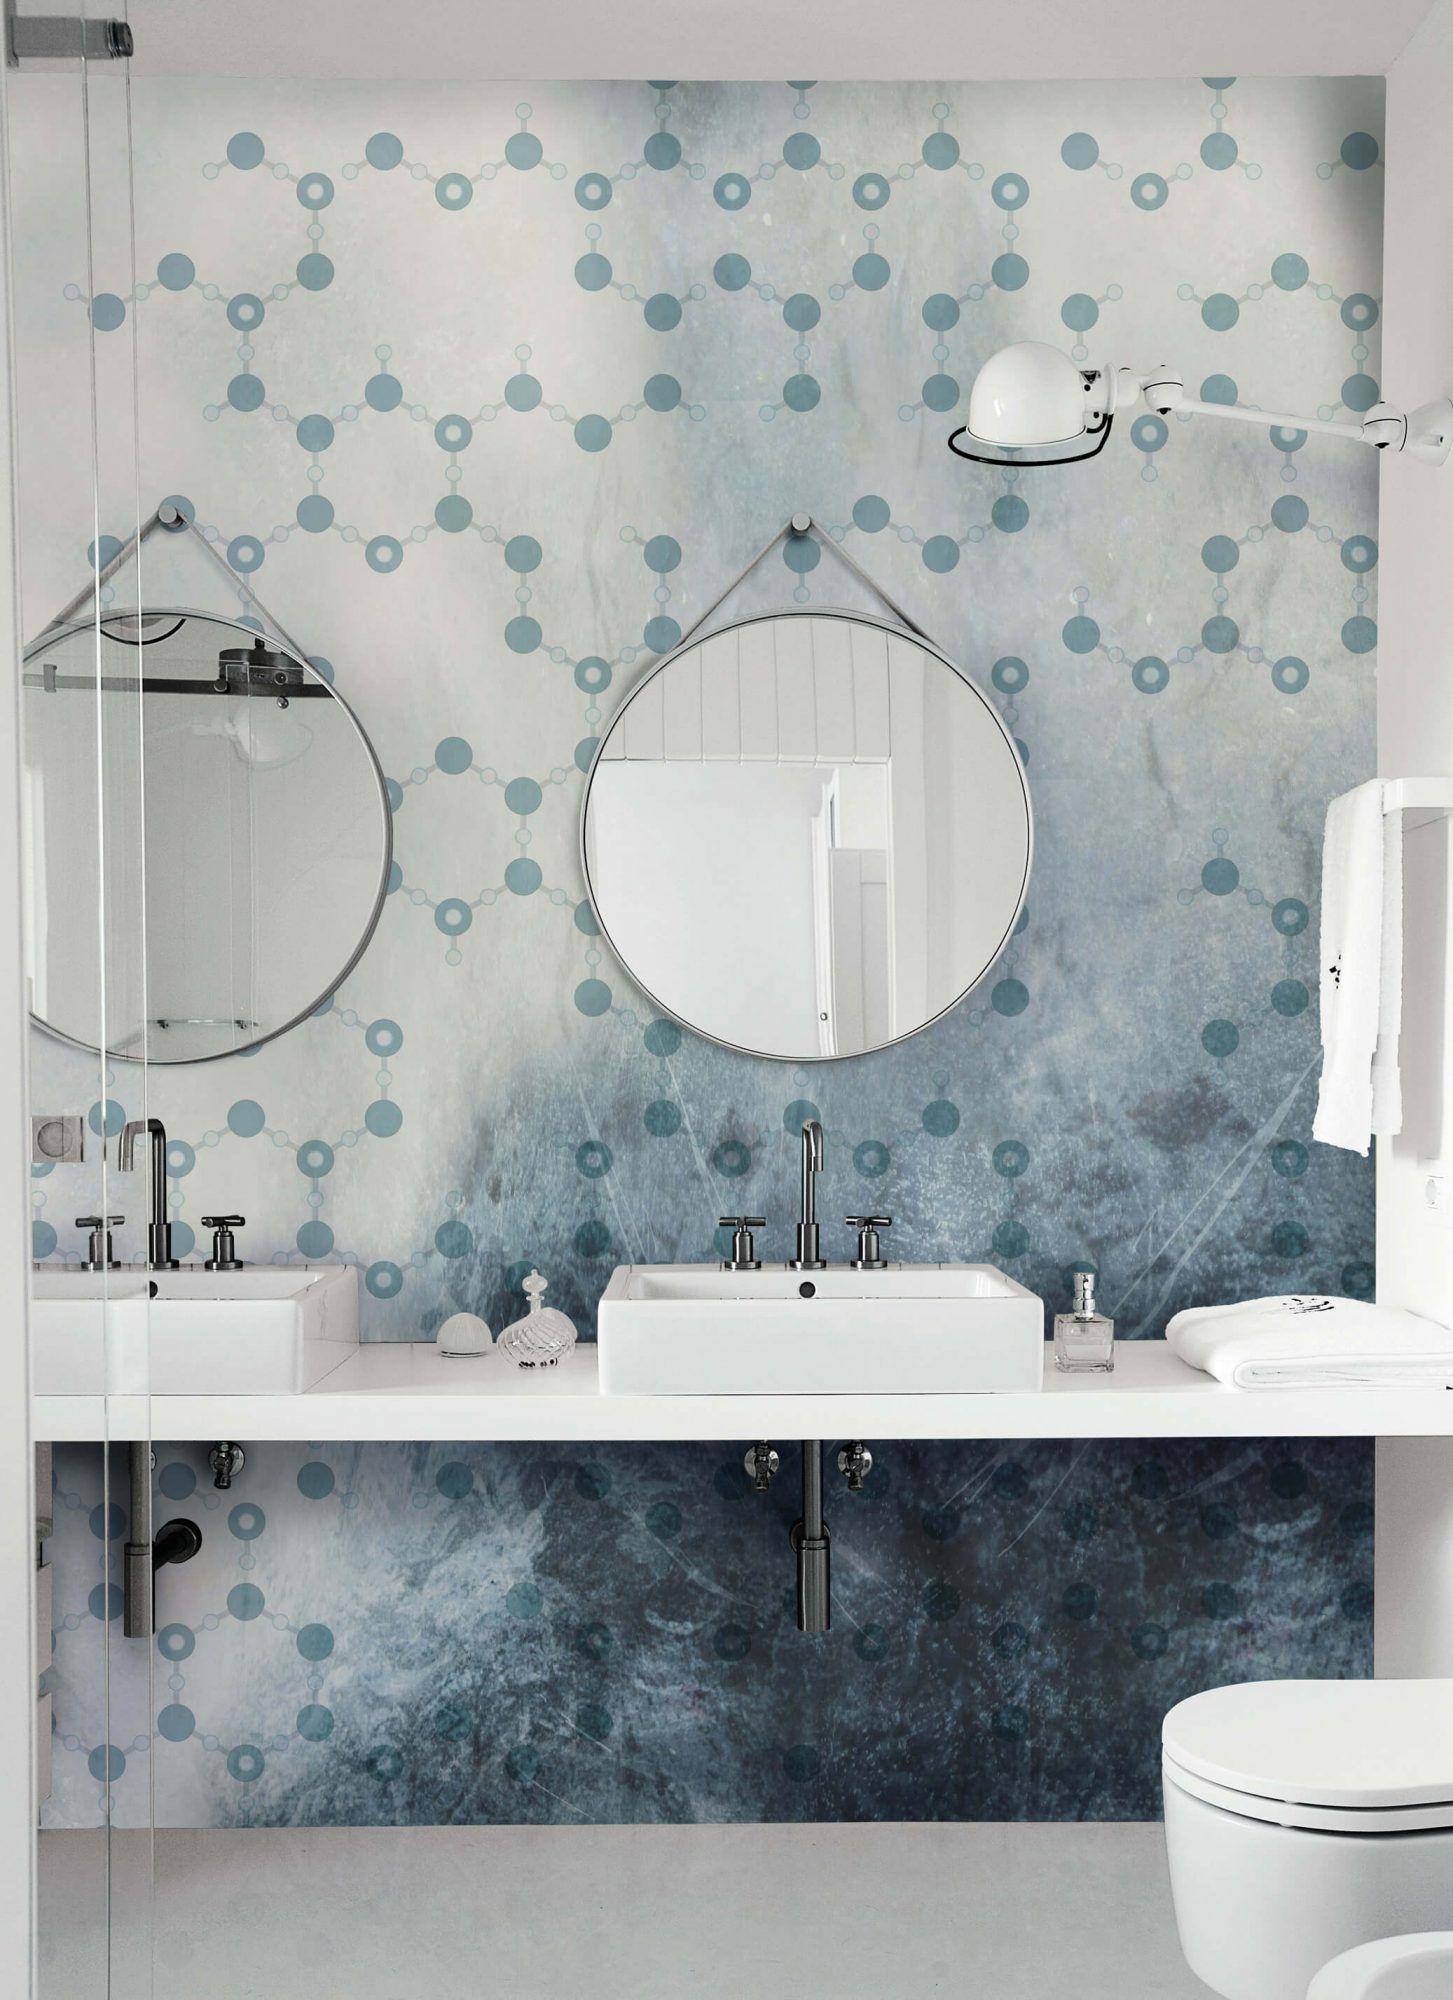 Wall Deco Wet System 16 Frozen Waterproof Wallpaper Waterproof Bathroom Wall Panels Bathroom Wall Panels Bathroom Tile Designs